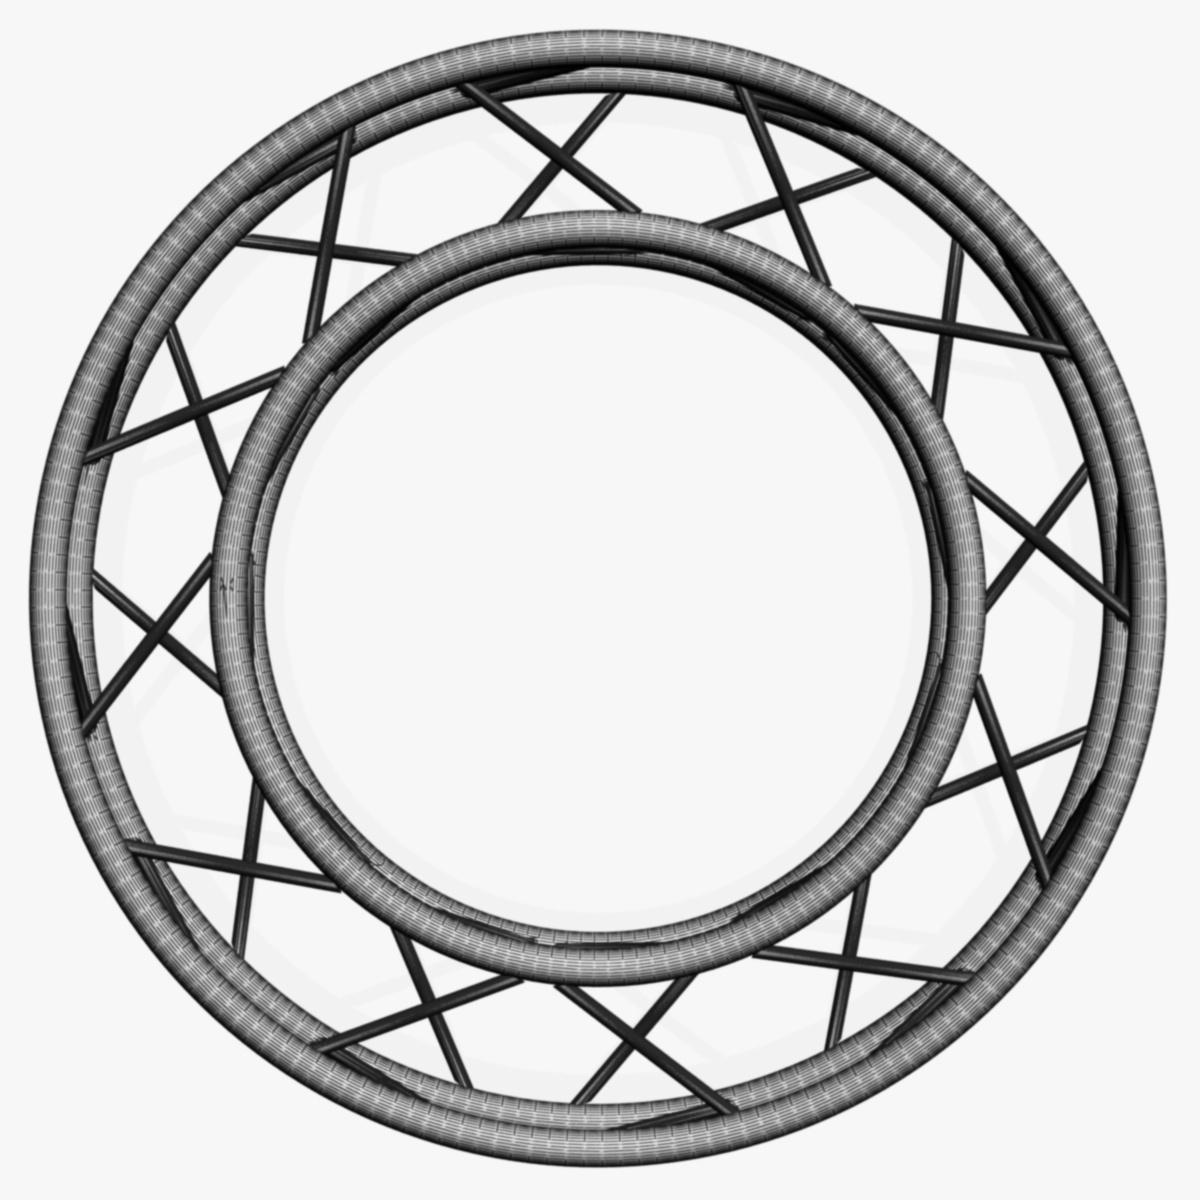 circle square truss full diameter 150cm 3d model 3ds max fbx c4d dae  obj 252301